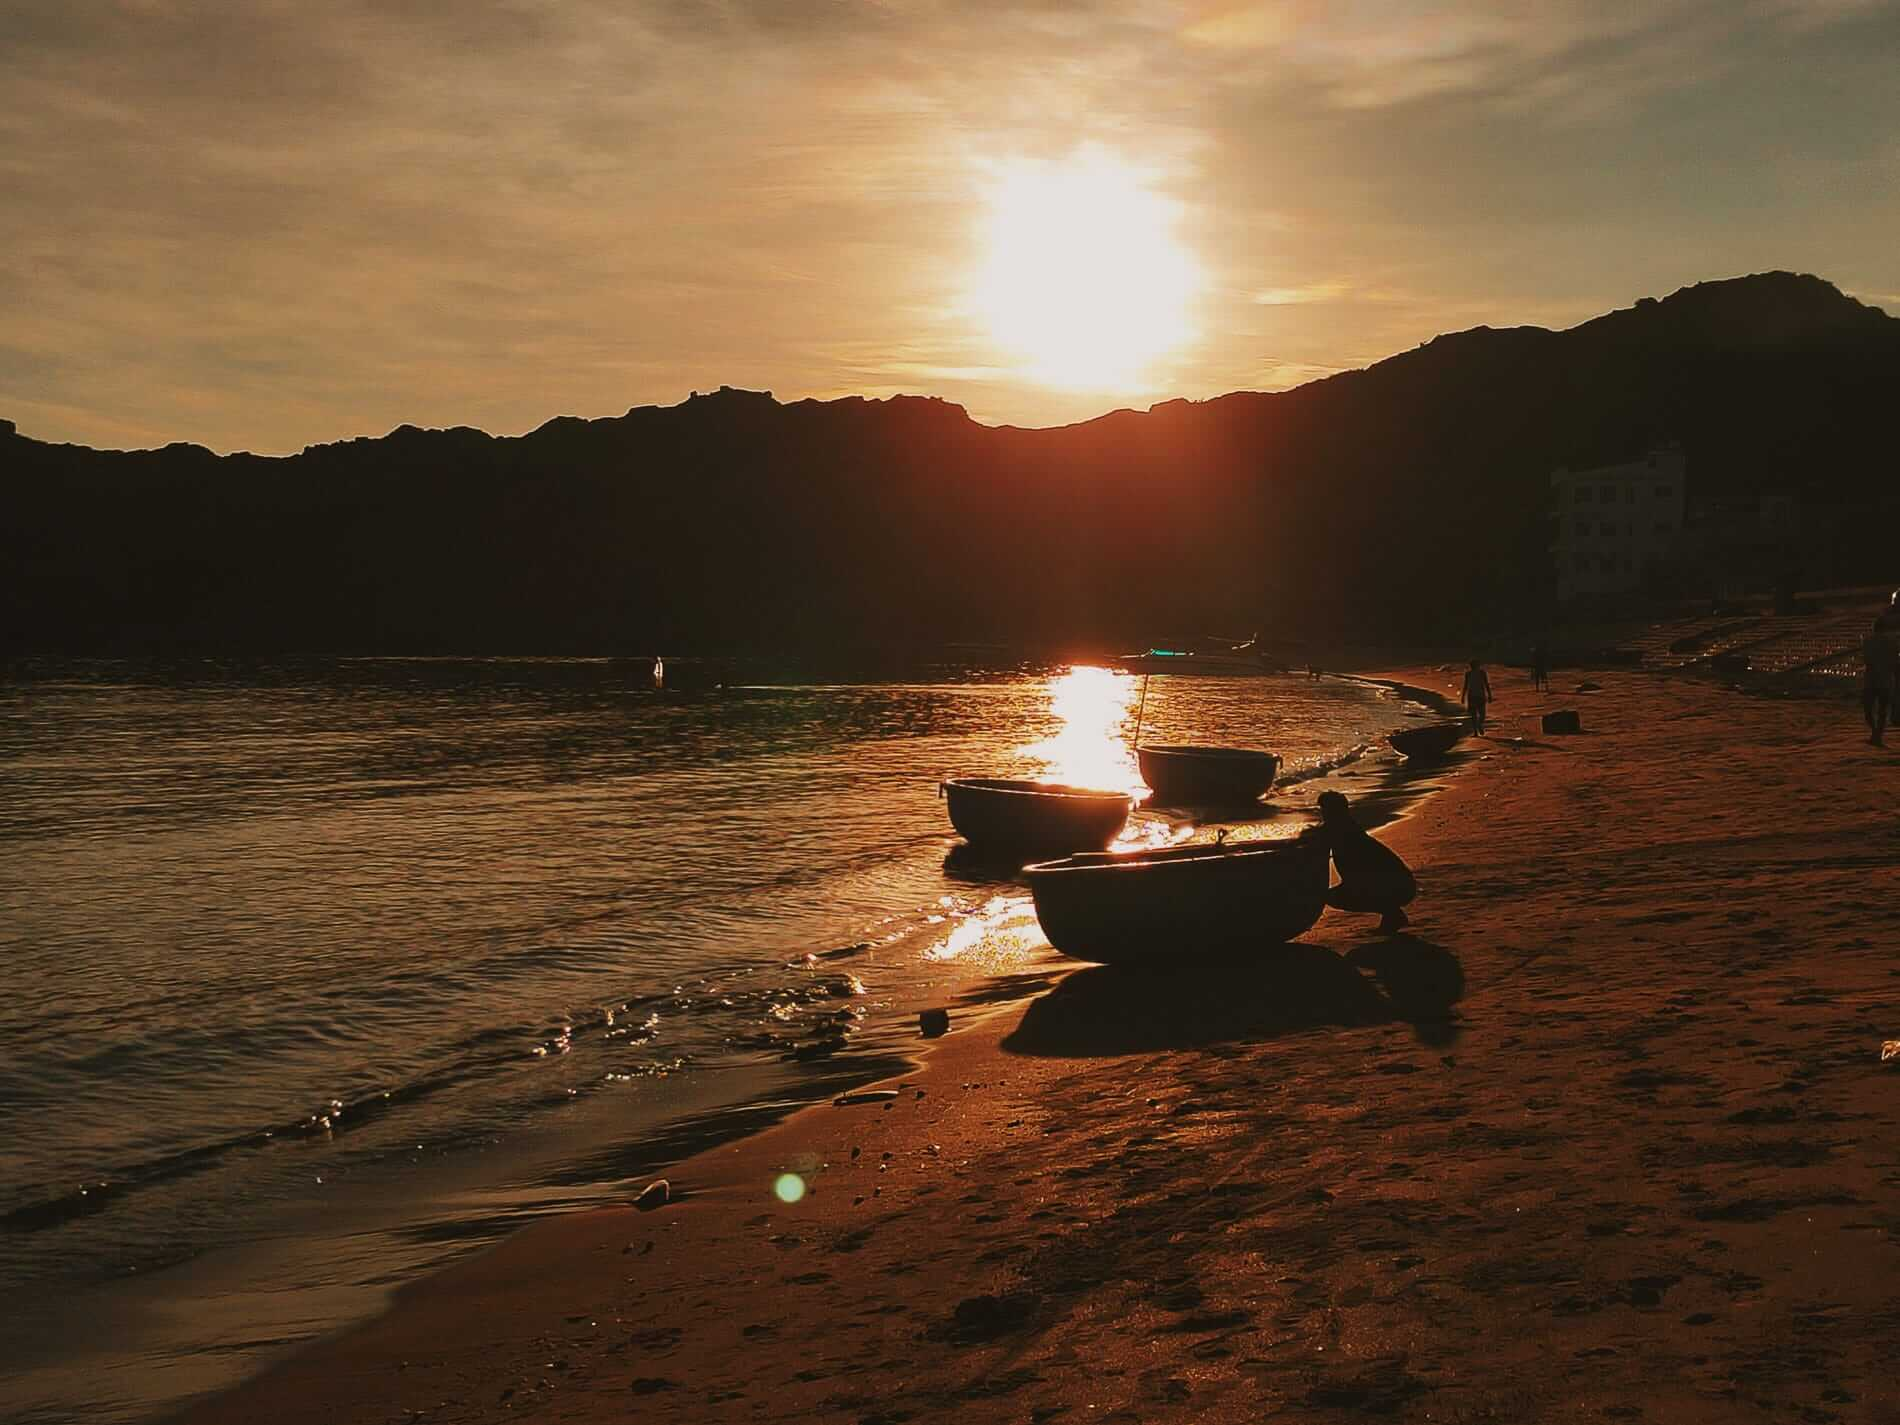 Bai Xep fishing village